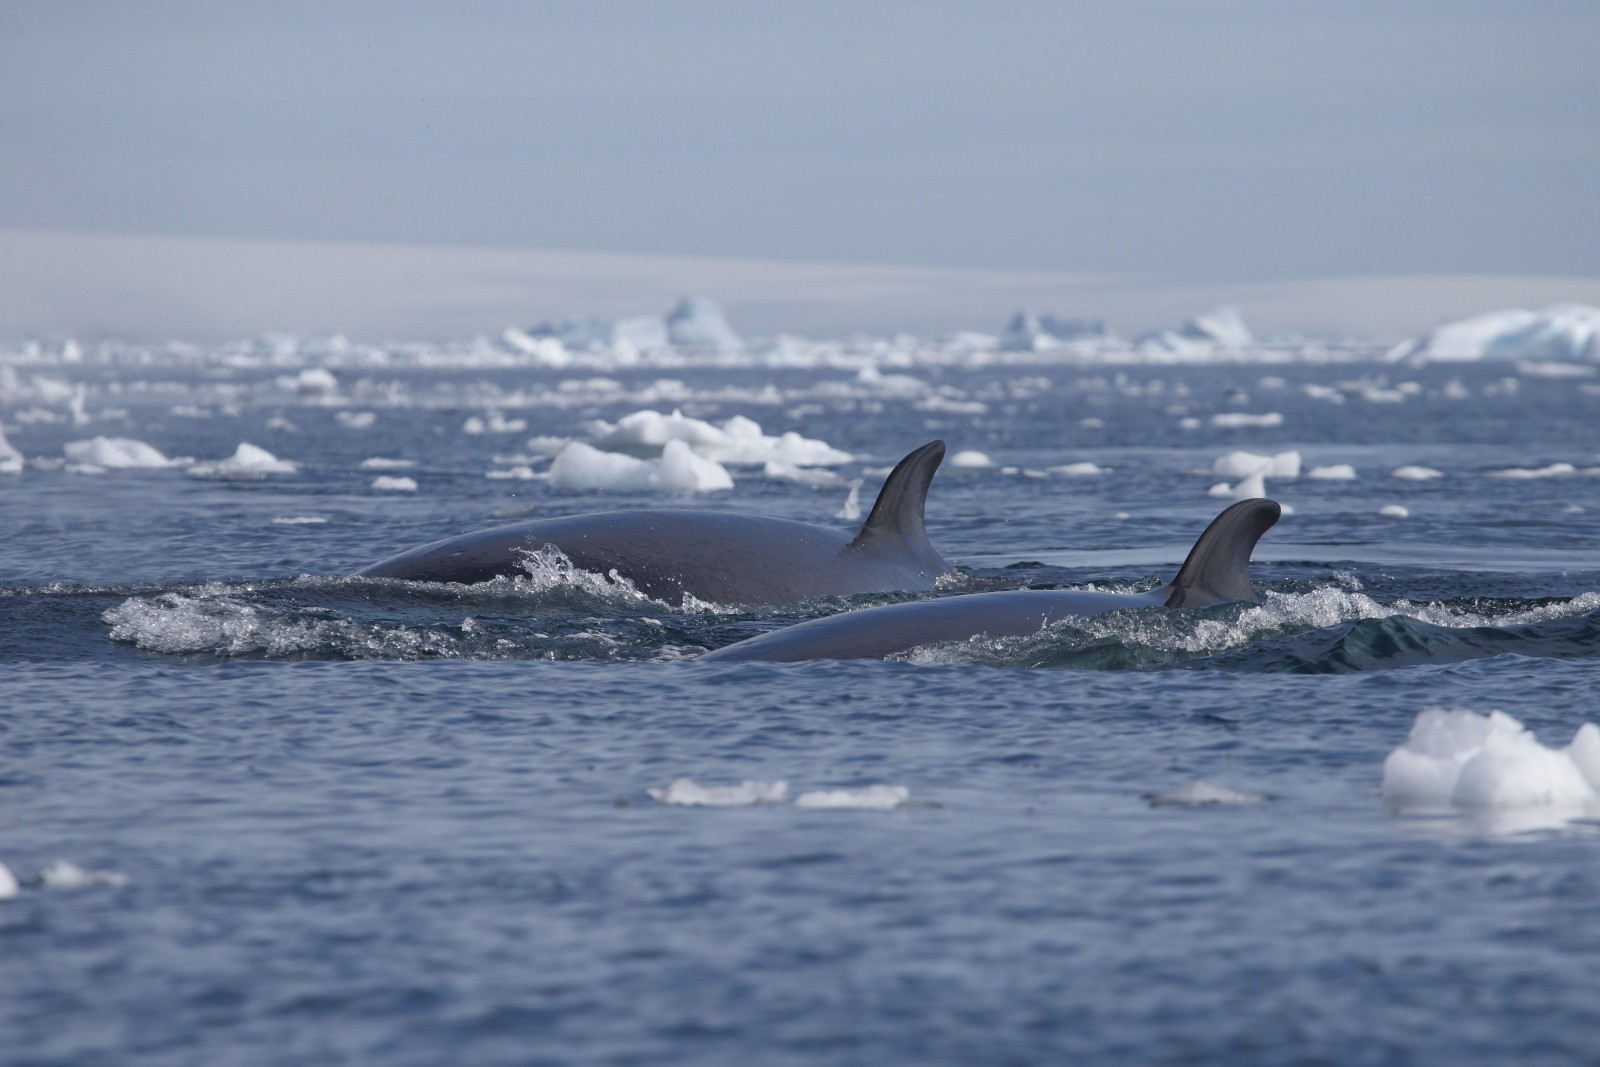 Double Dorsal Fins, Antarctica, Supplier Photo (Unscape)